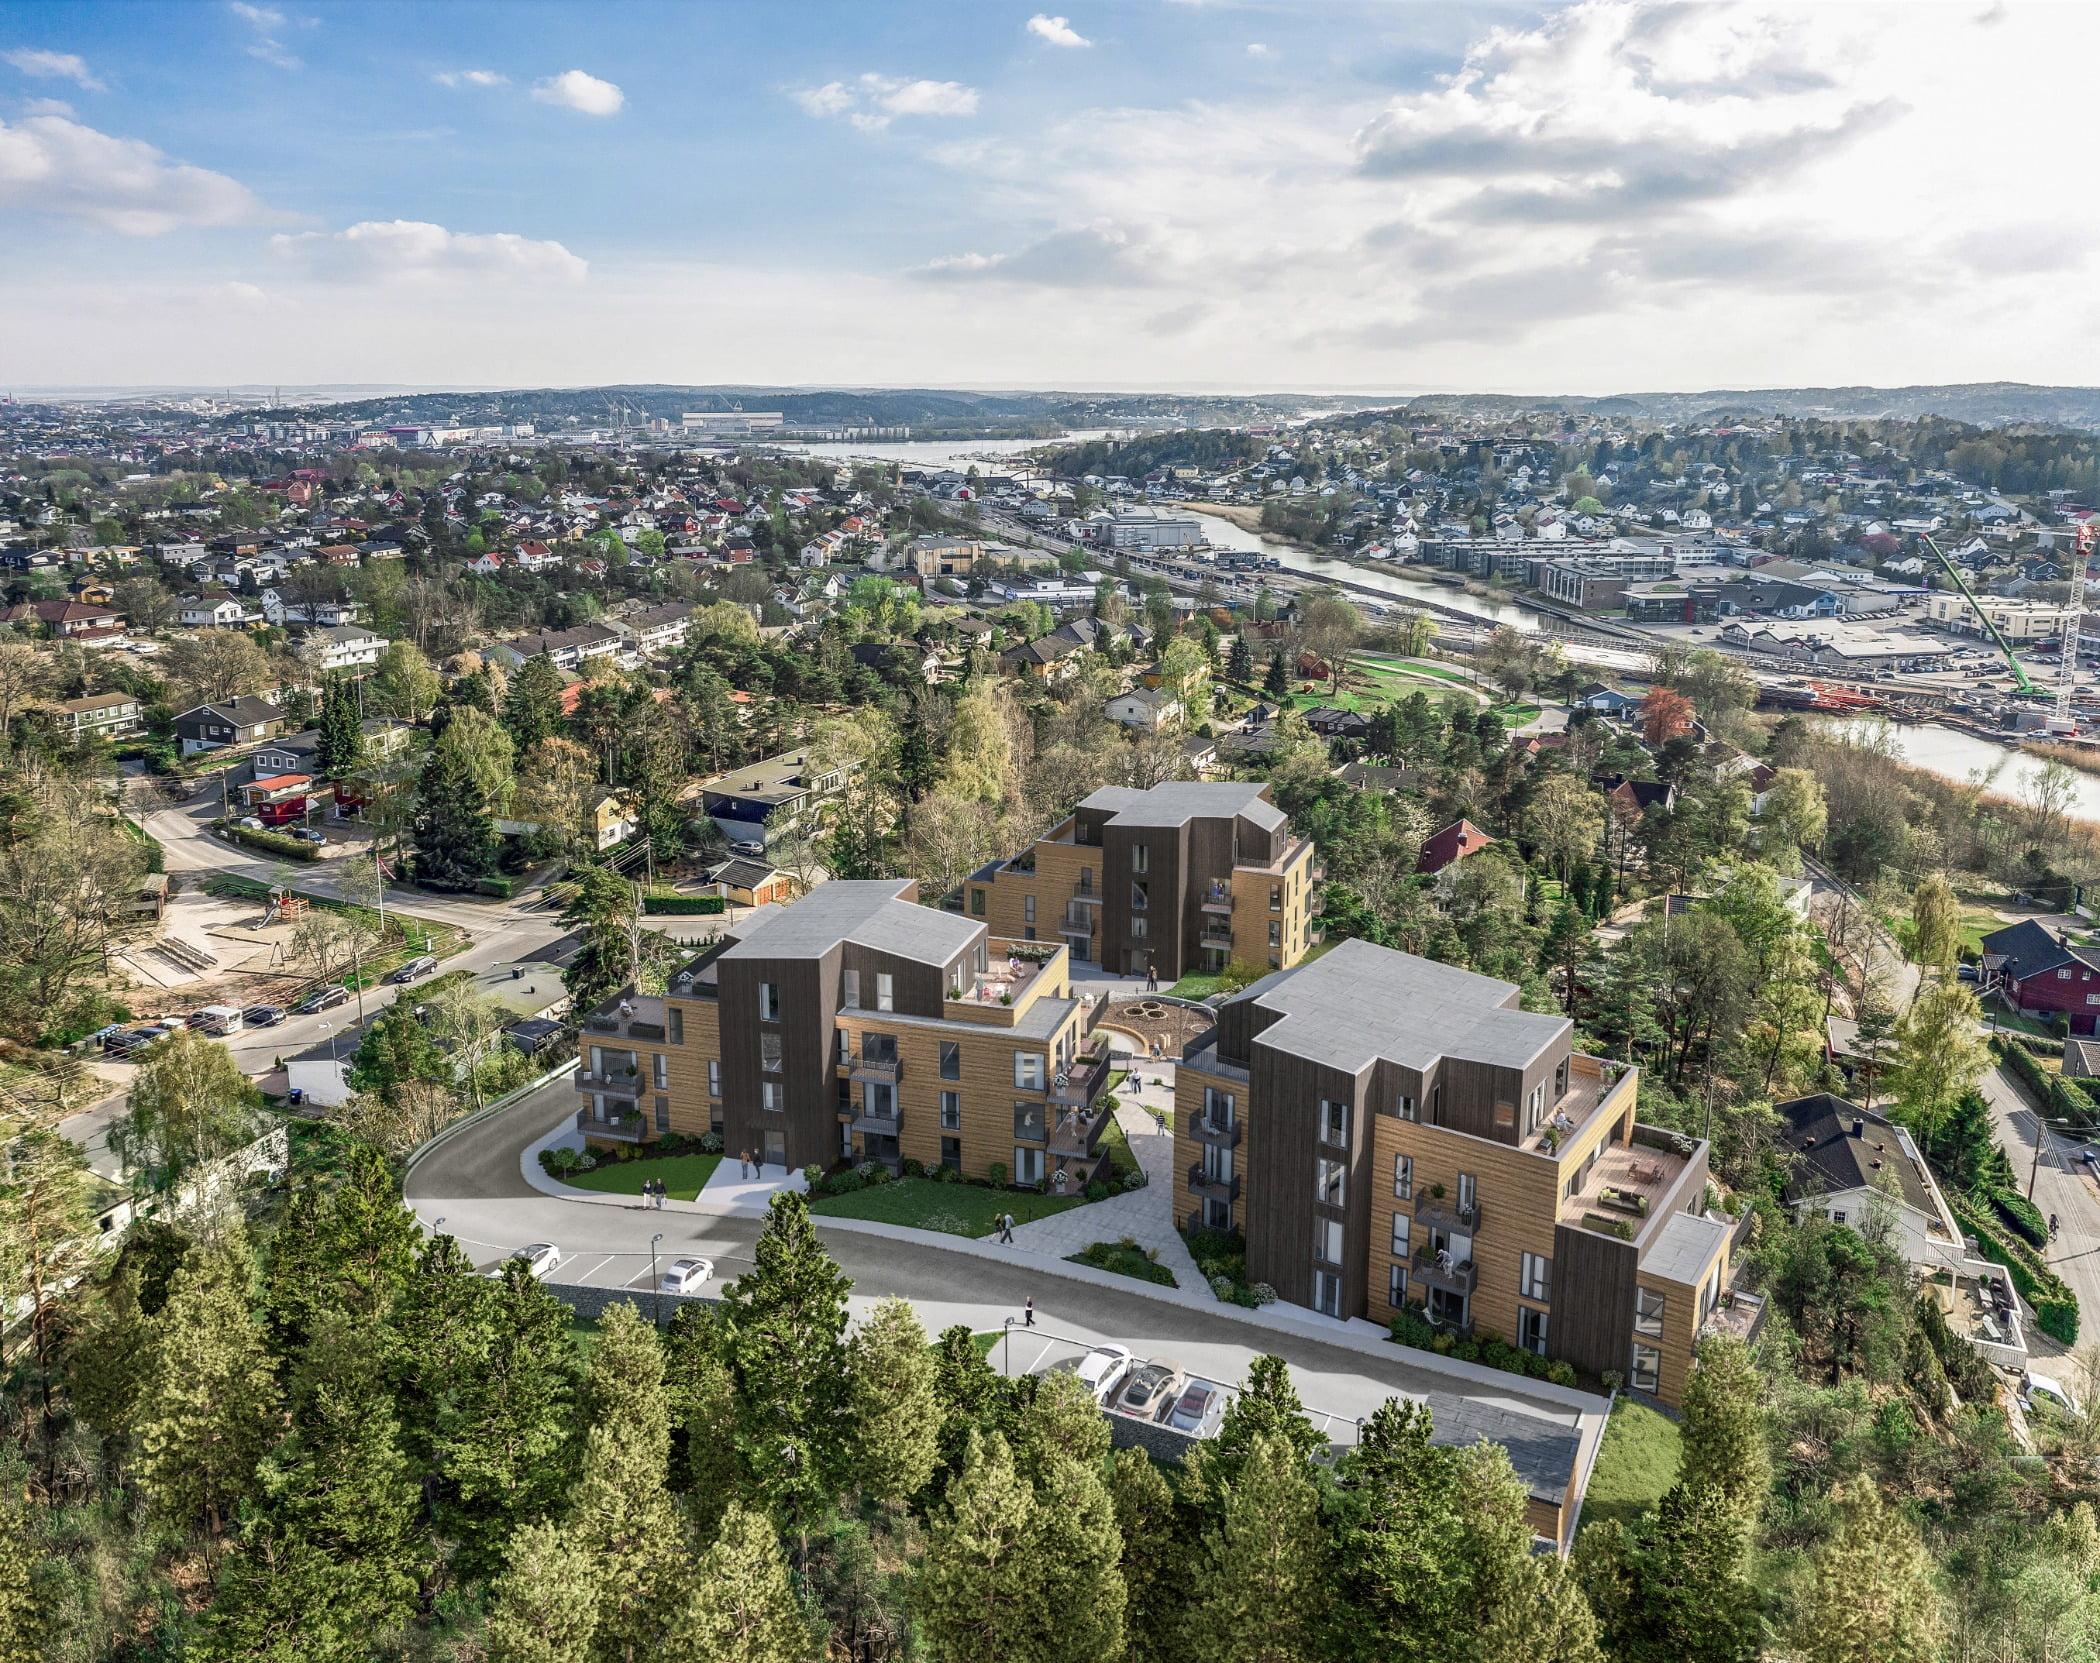 Urban design, Land lot, Cloud, Sky, Building, Property, Plant, Tree, Window, Architecture